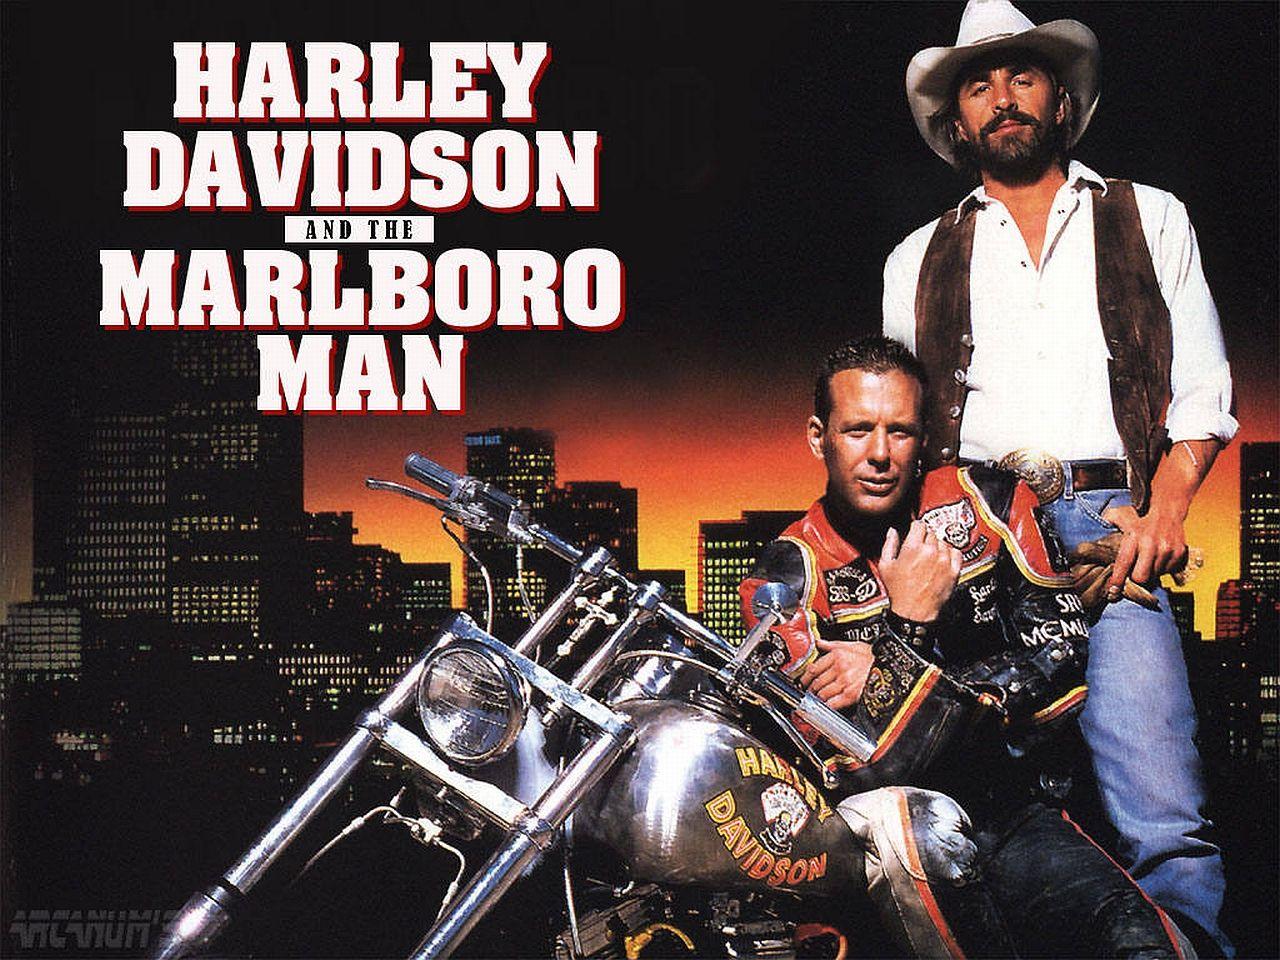 Movie - Harley Davidson and the Marlboro man Wallpaper